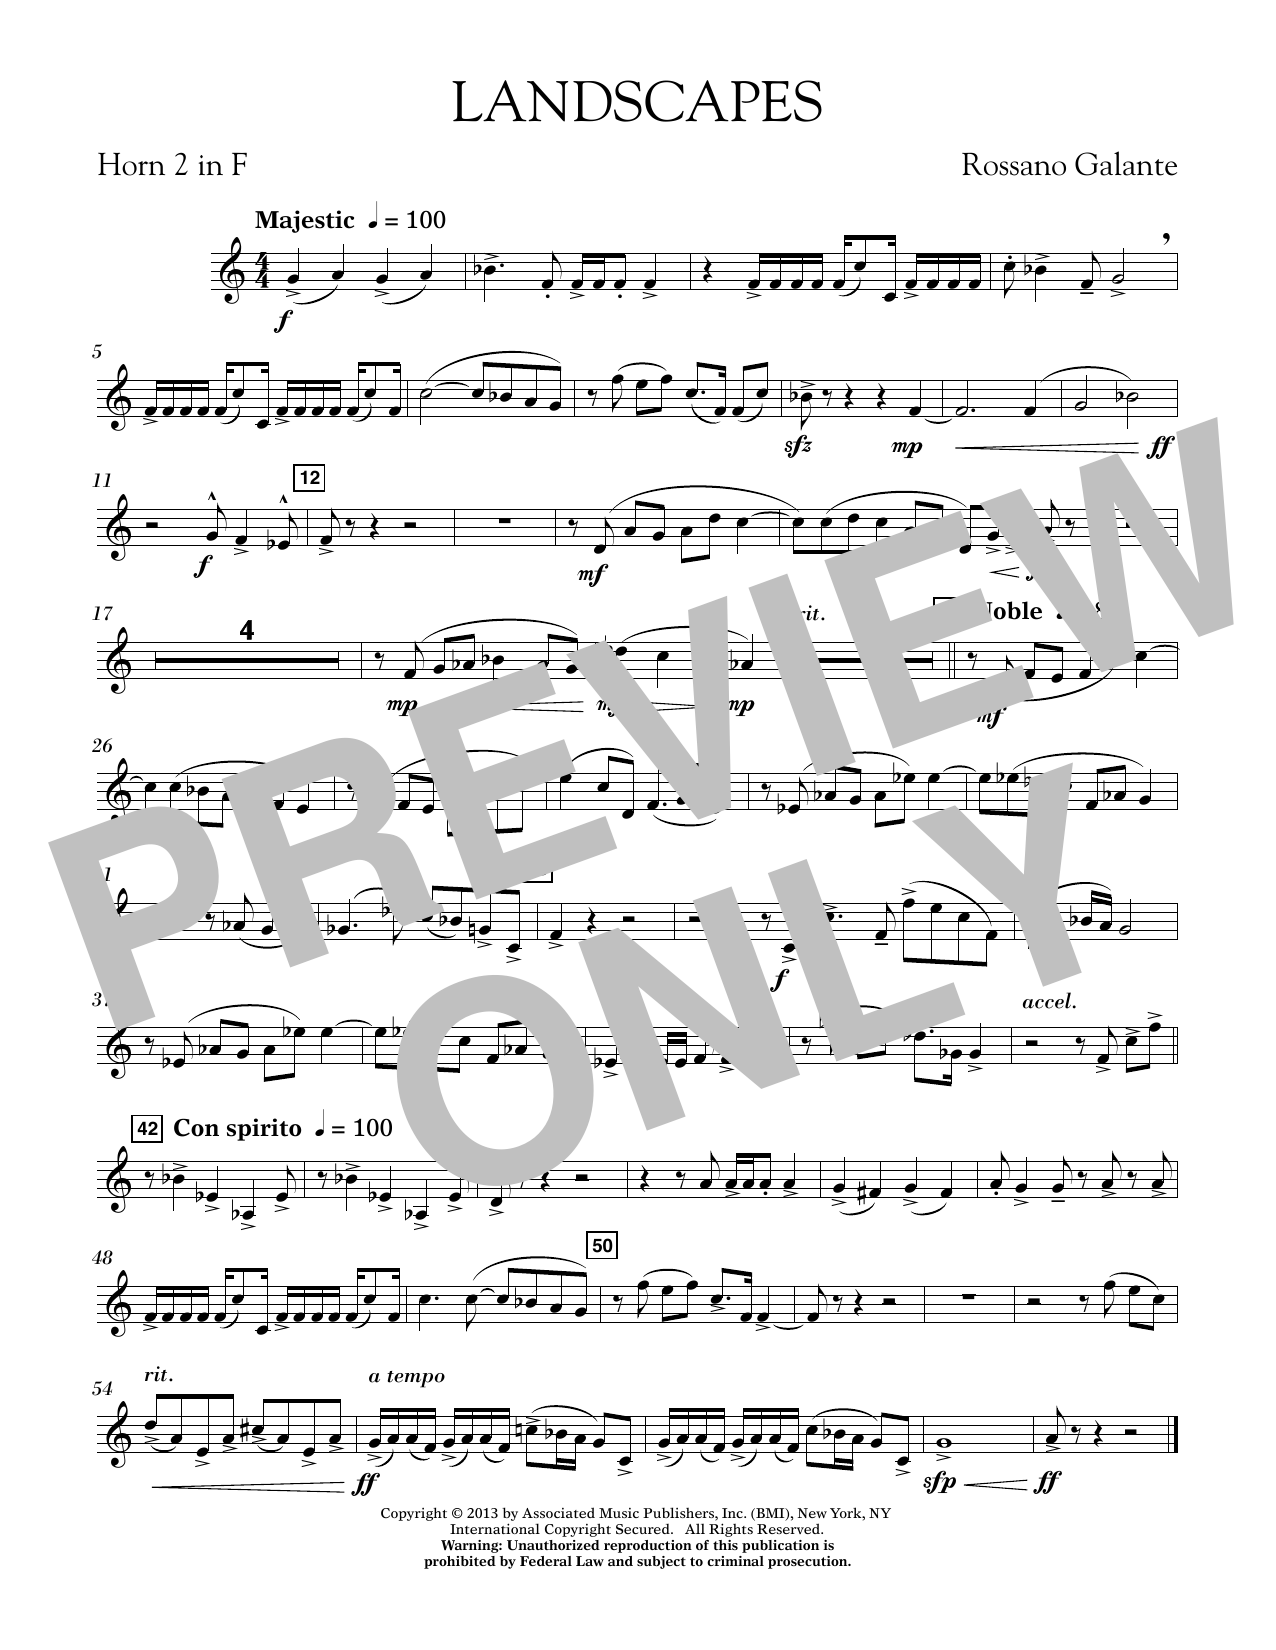 Rosanno Galante Landscapes - F Horn 2 sheet music notes printable PDF score